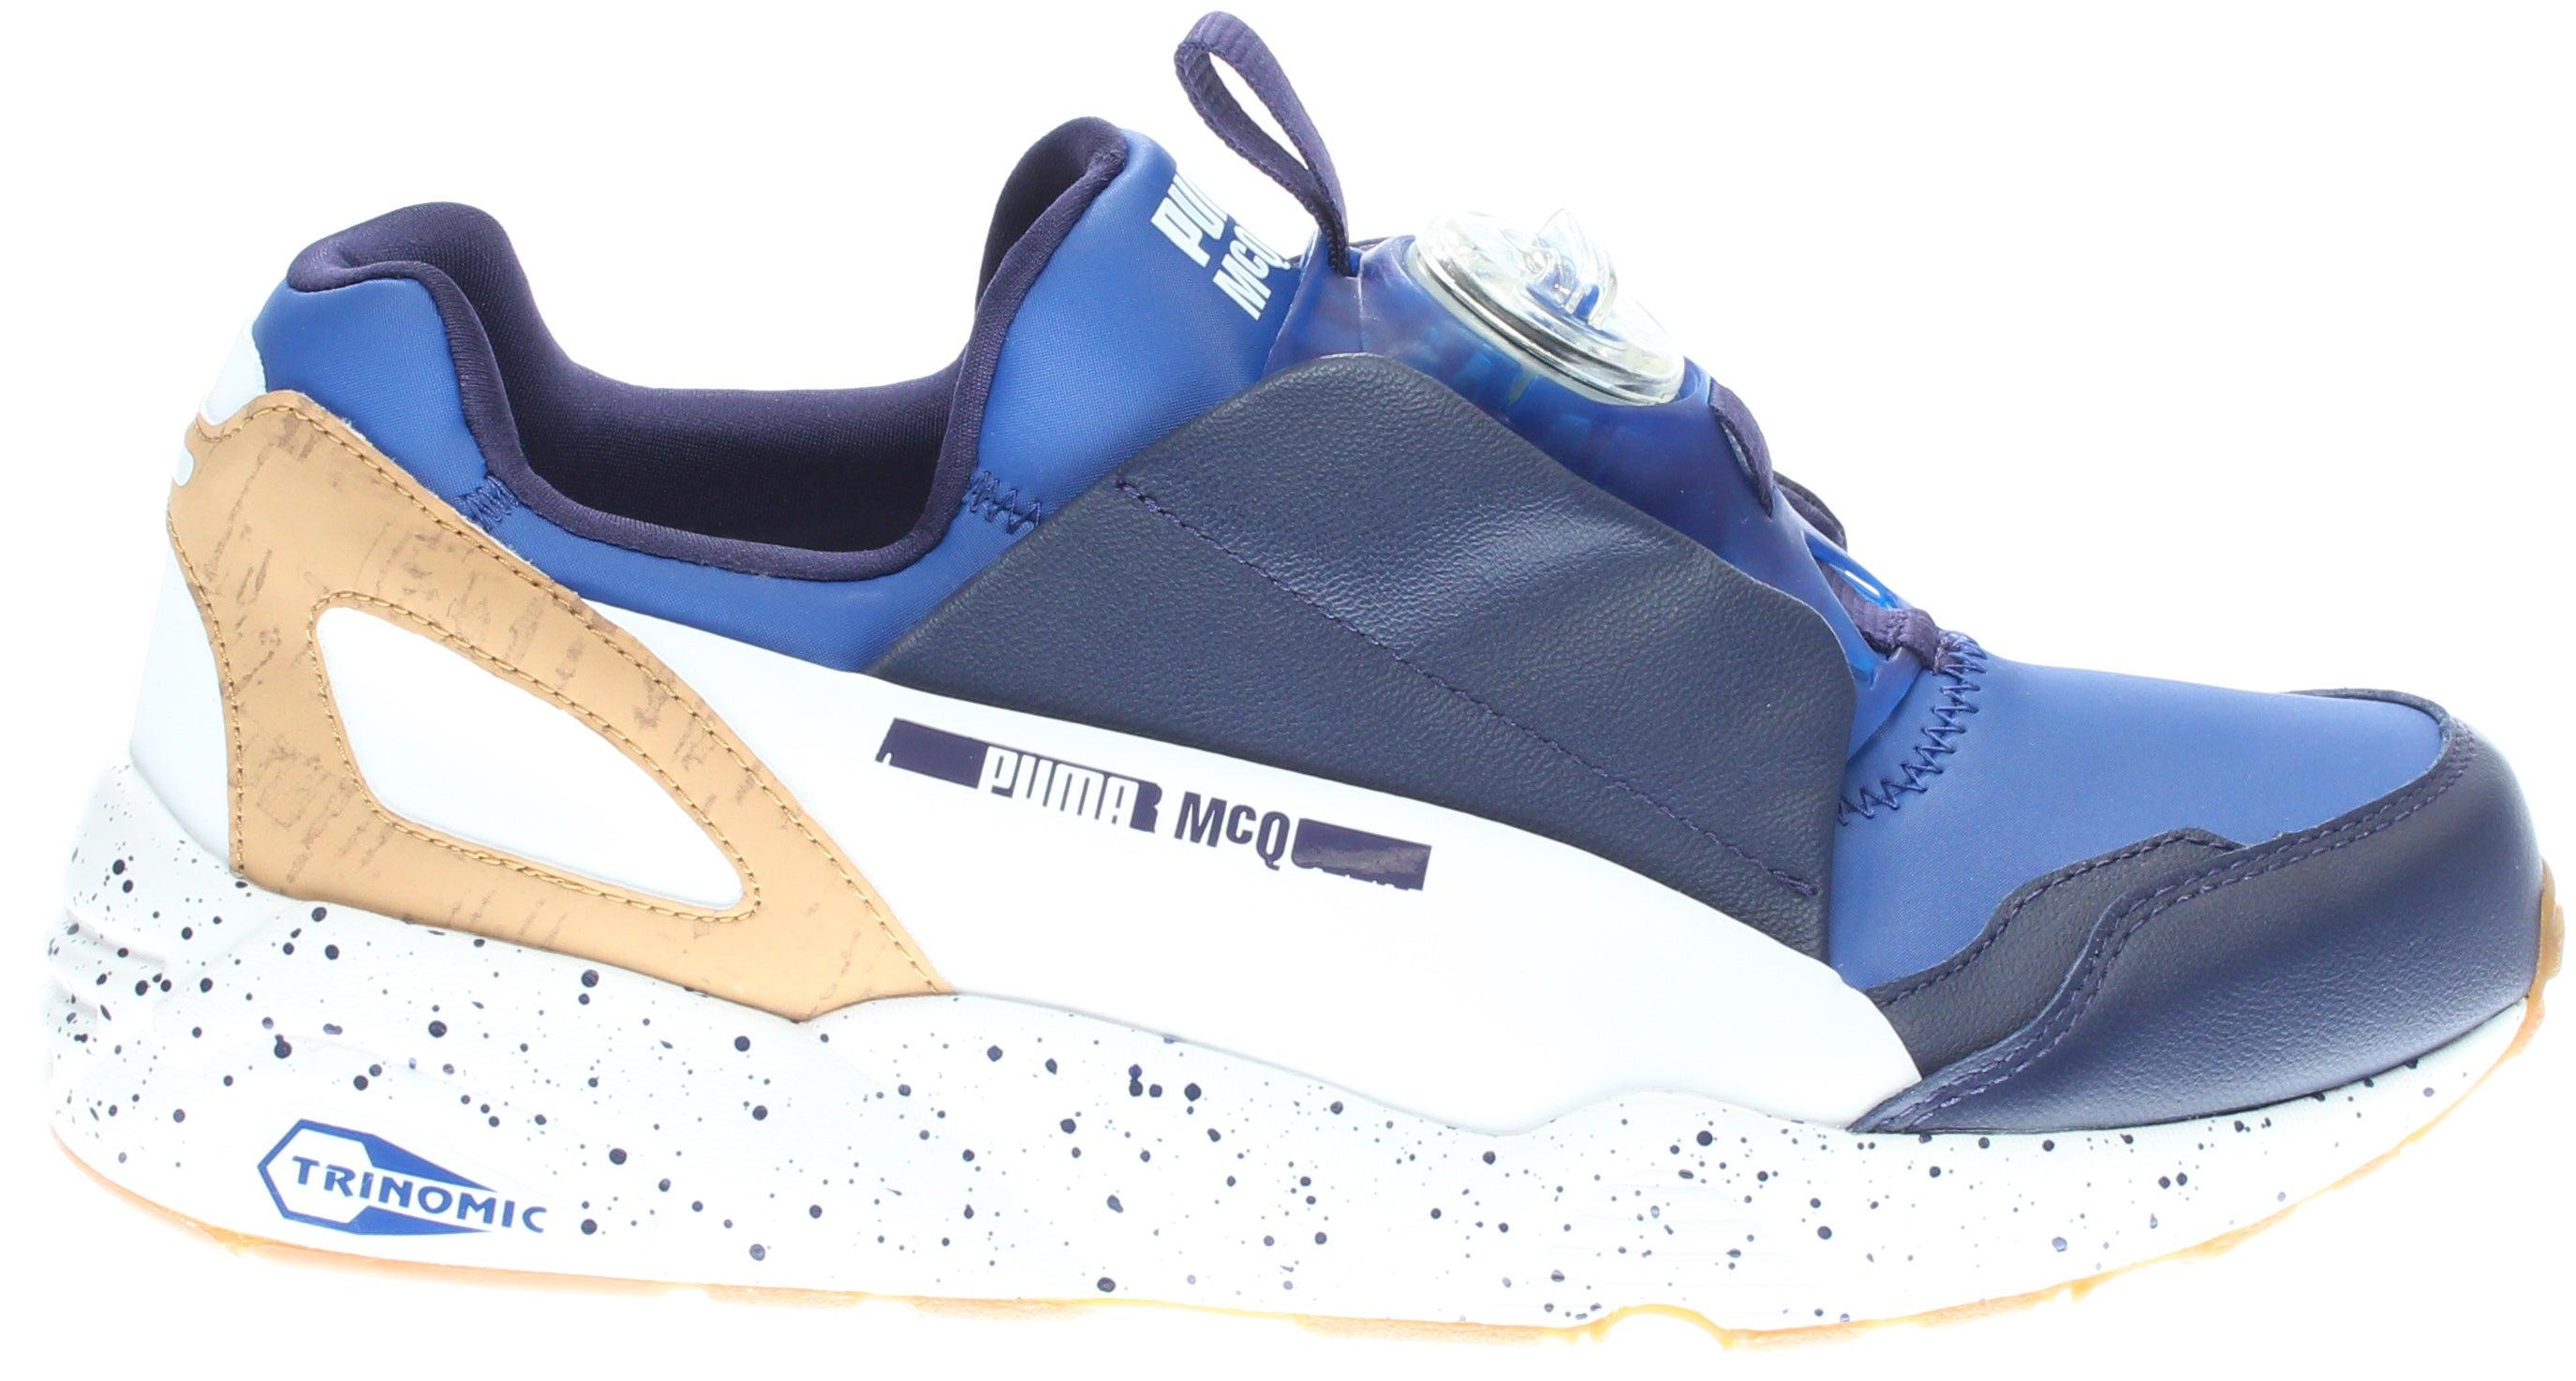 Puma X MCQ Disc Blue Blue - Mens  - Size 12